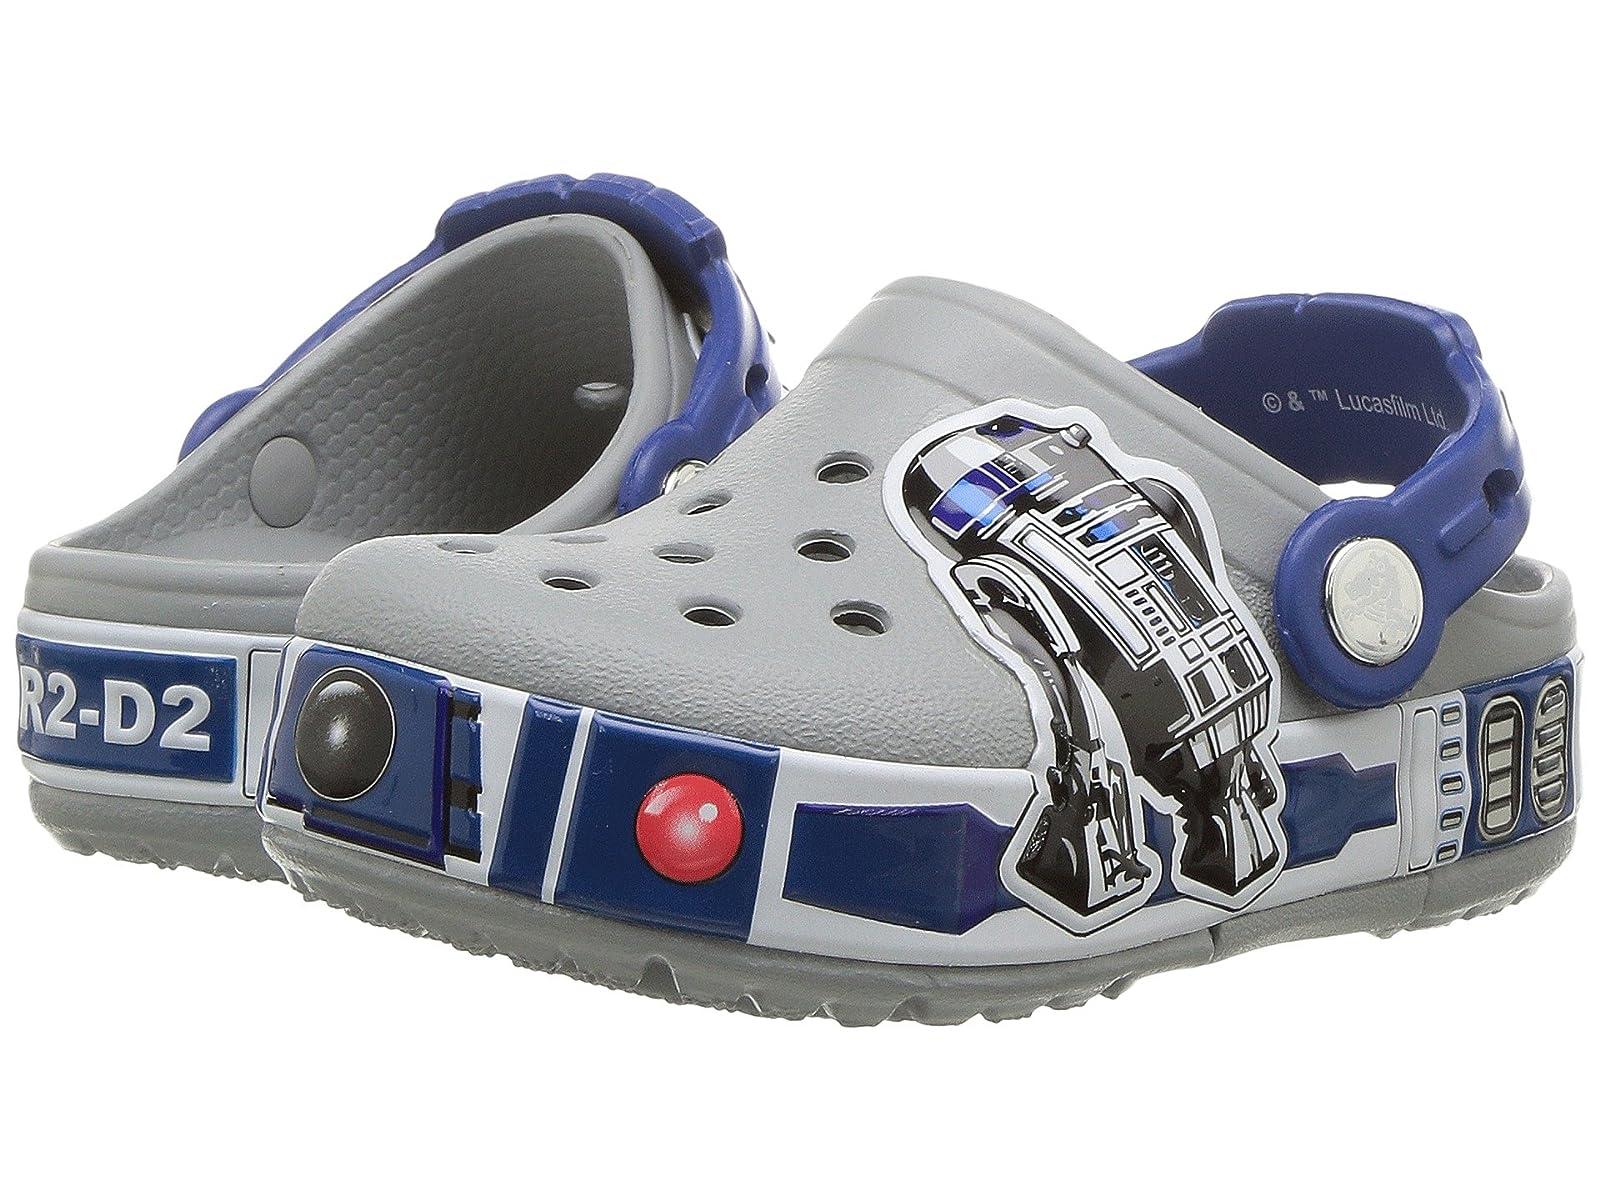 Crocs Kids Crocband R2D2 Lights Clog (Toddler/Little Kid)Economical and quality shoes